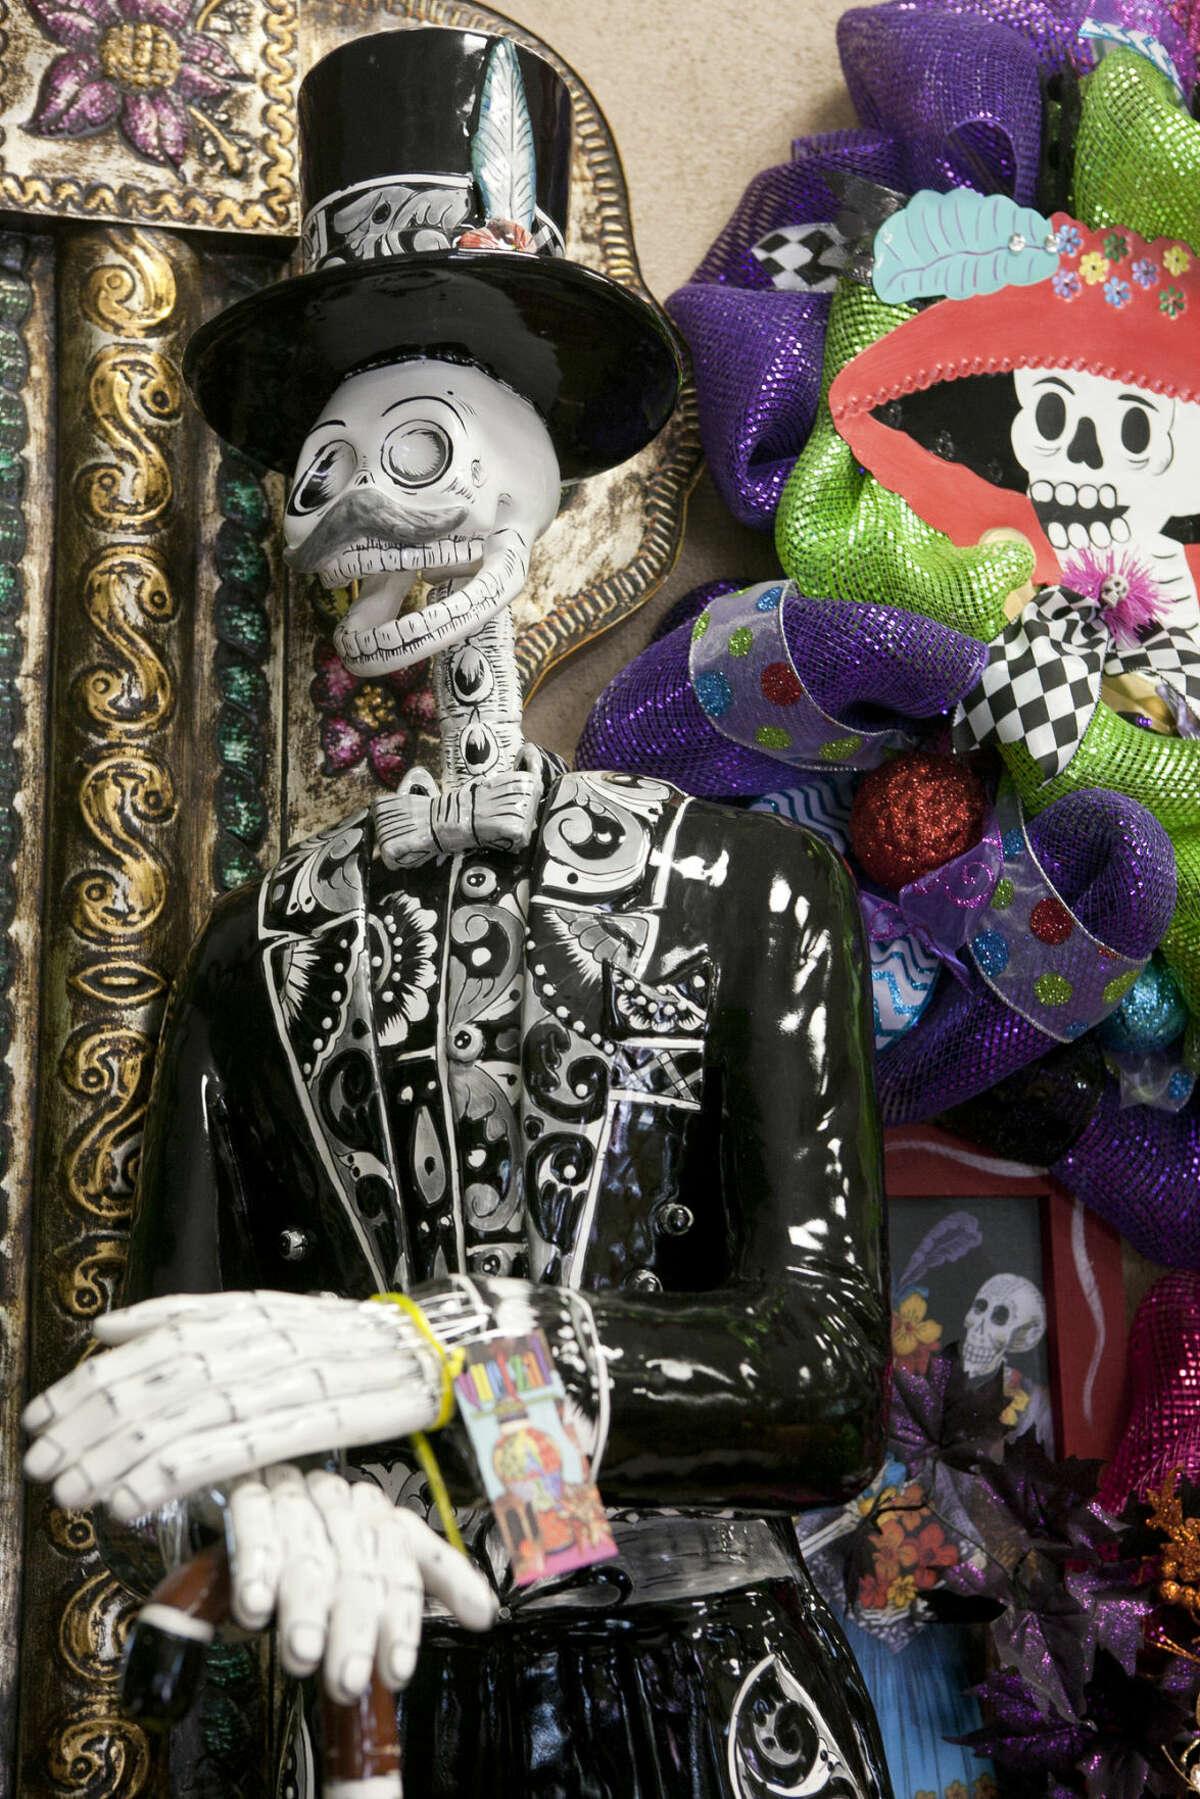 A Dia de Los Muertos (Day of the Dead) skeletal figure. James Durbin/Reporter-Telegram